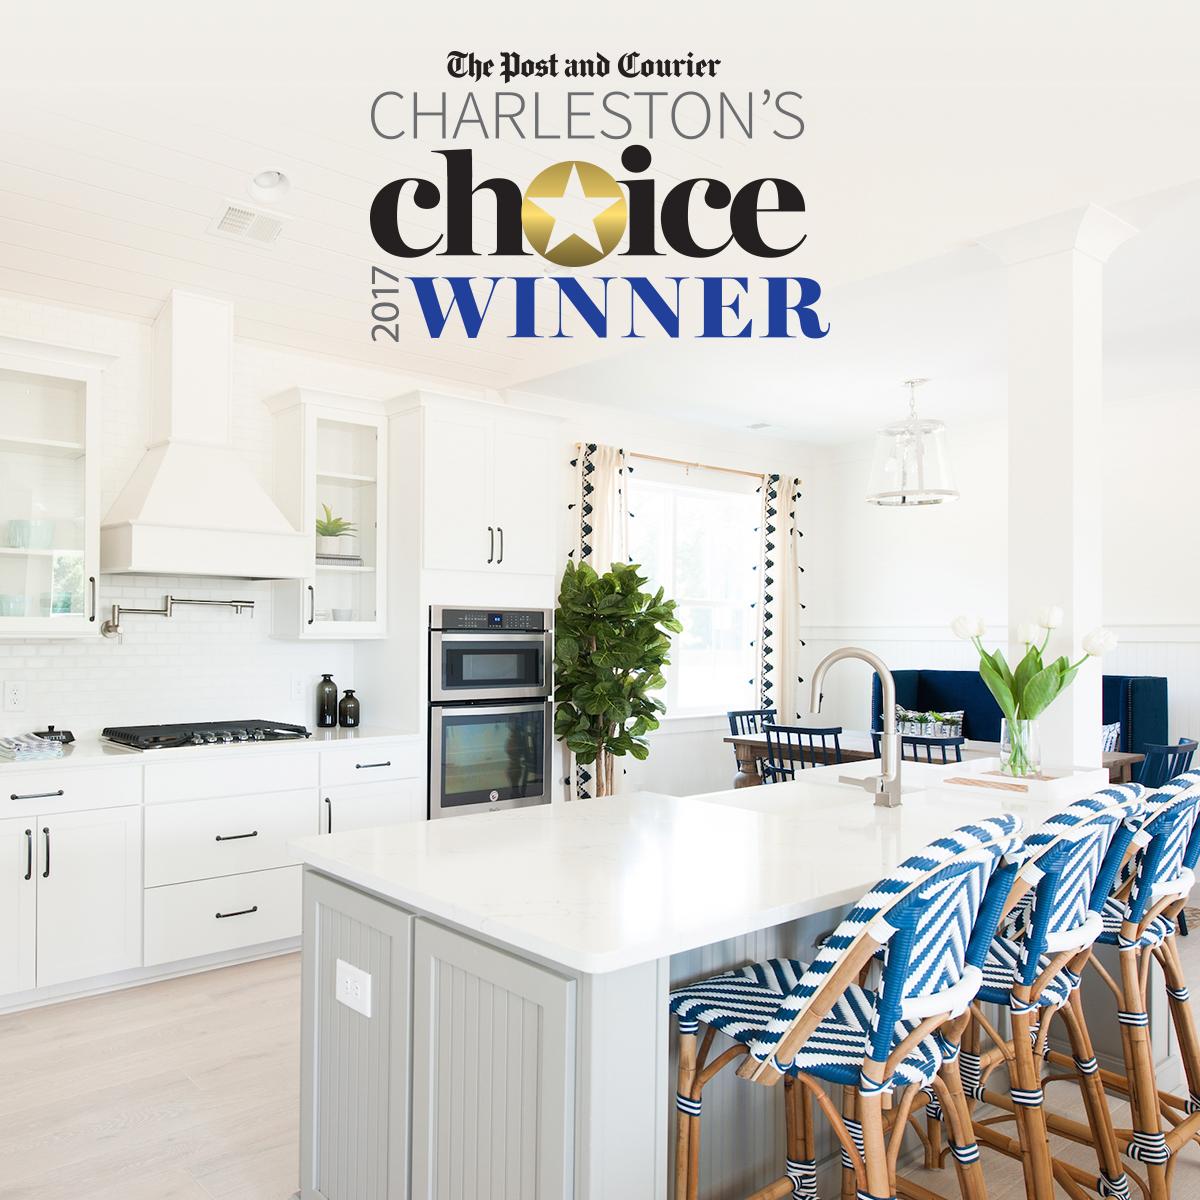 charleston-choice-winner-instagram-3